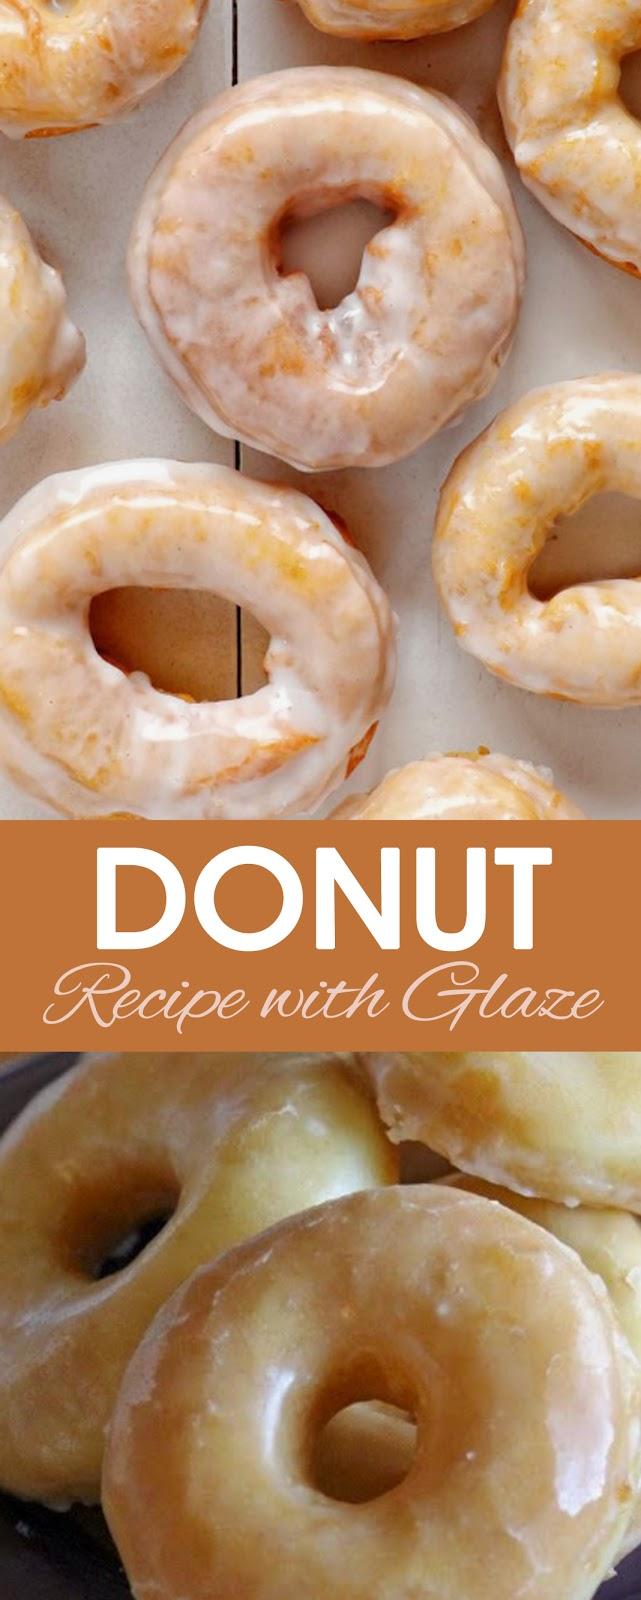 Raised Donut Recipe with Glaze